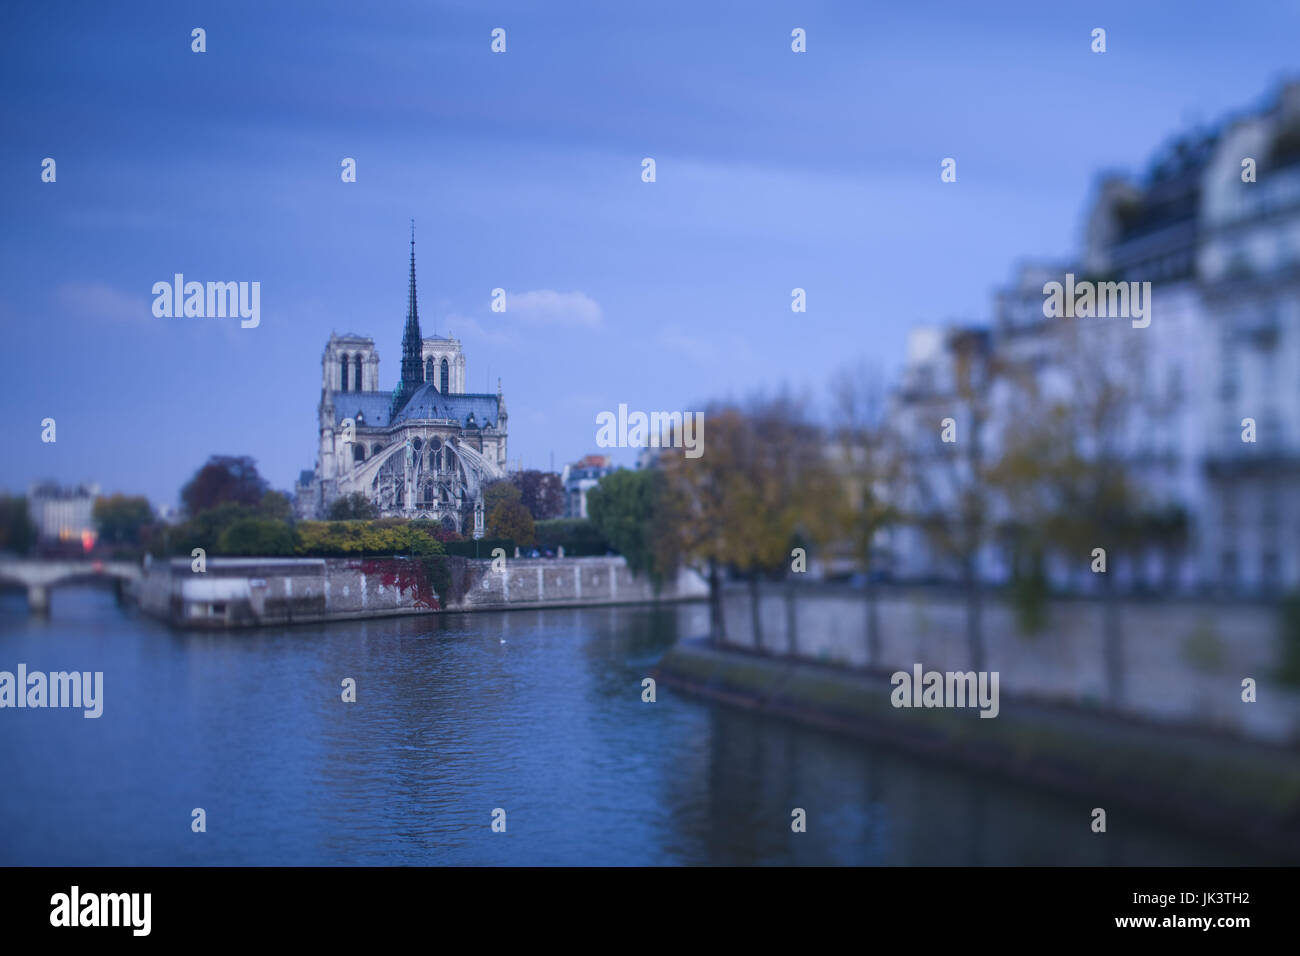 France, Paris, Notre-Dame cathedral and Ile St-Louis buildings, dawn, defocussed - Stock Image